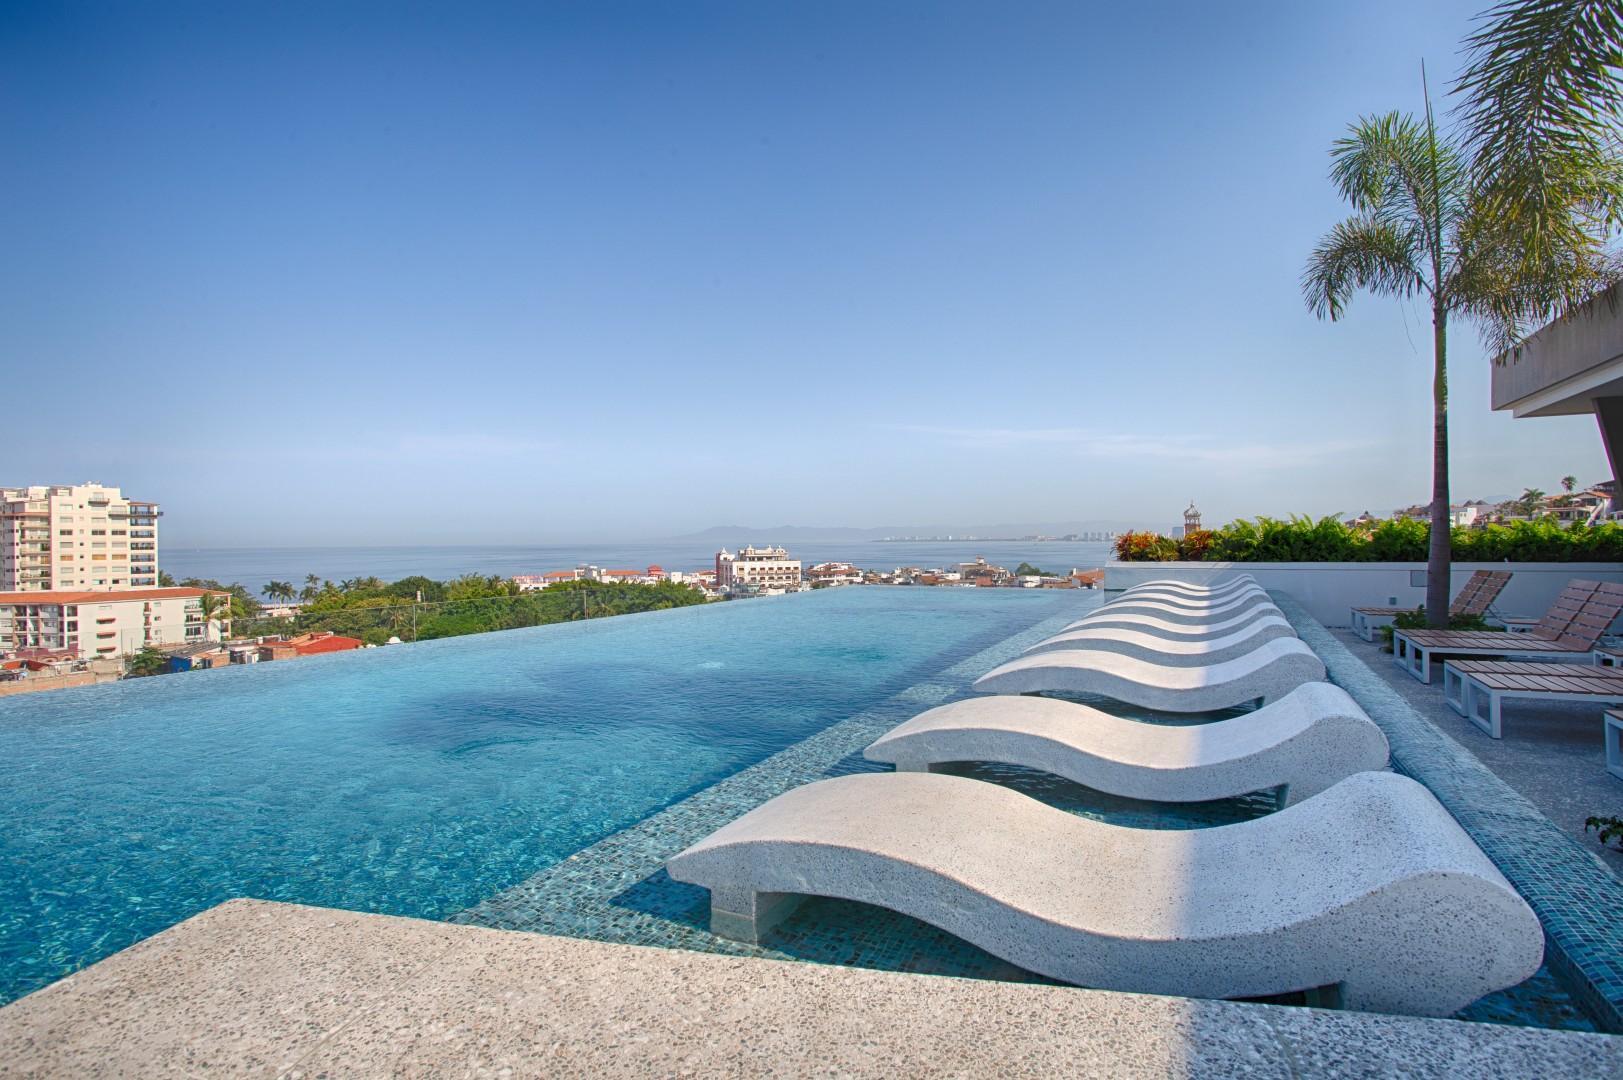 NEW Condo @ AVIDA   Great Location, Stunning Amenities